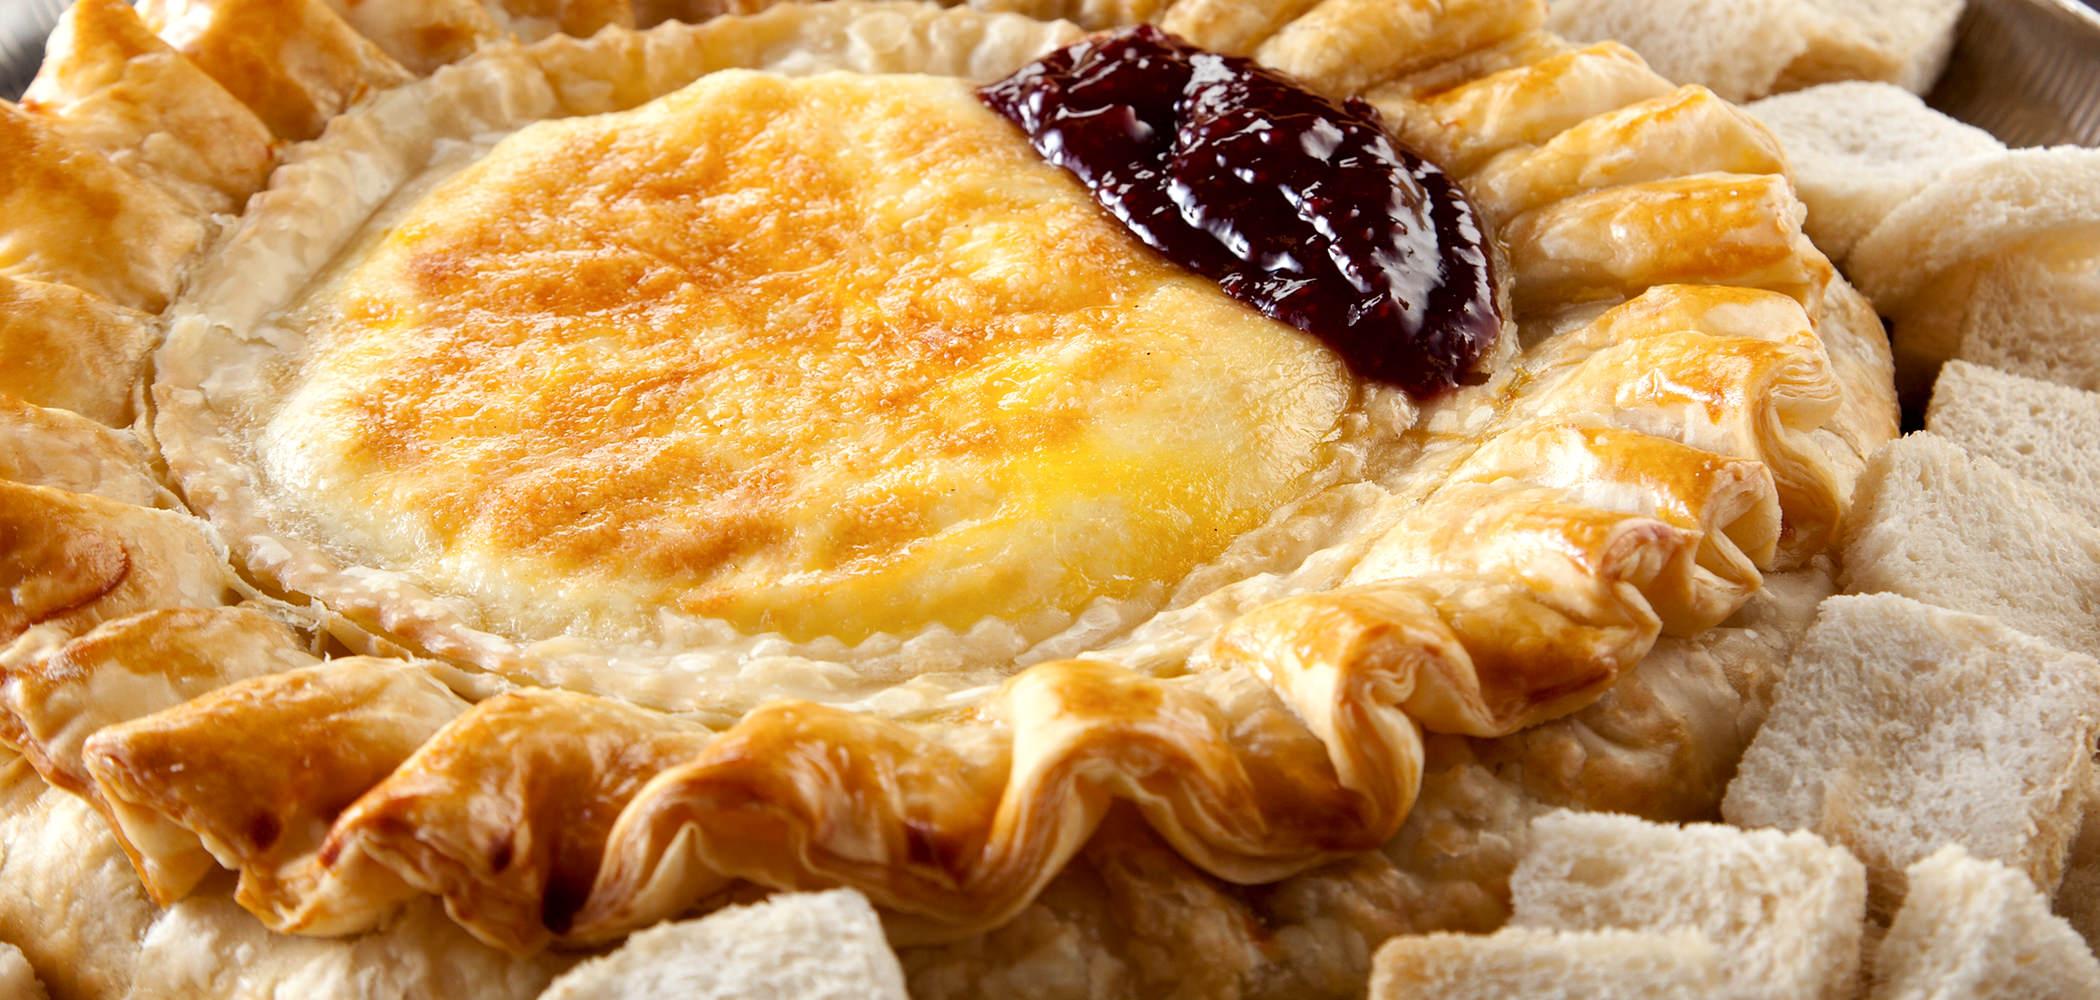 Brie+Folhado+Sole+Gourmet+.jpg